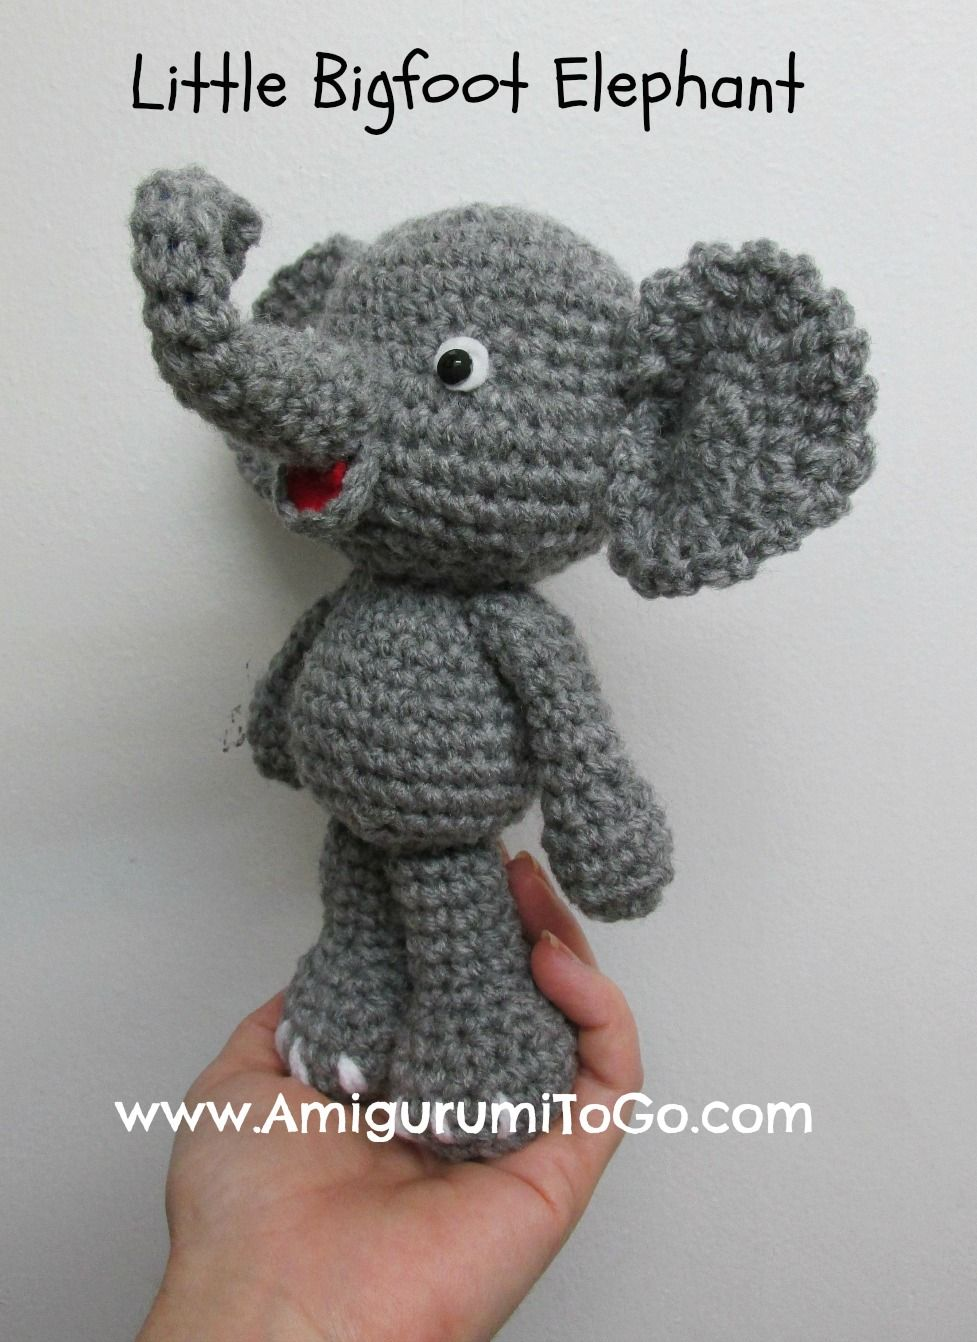 Amigurumi To Go: Cute Elephant Video Tutorial In The Works ...